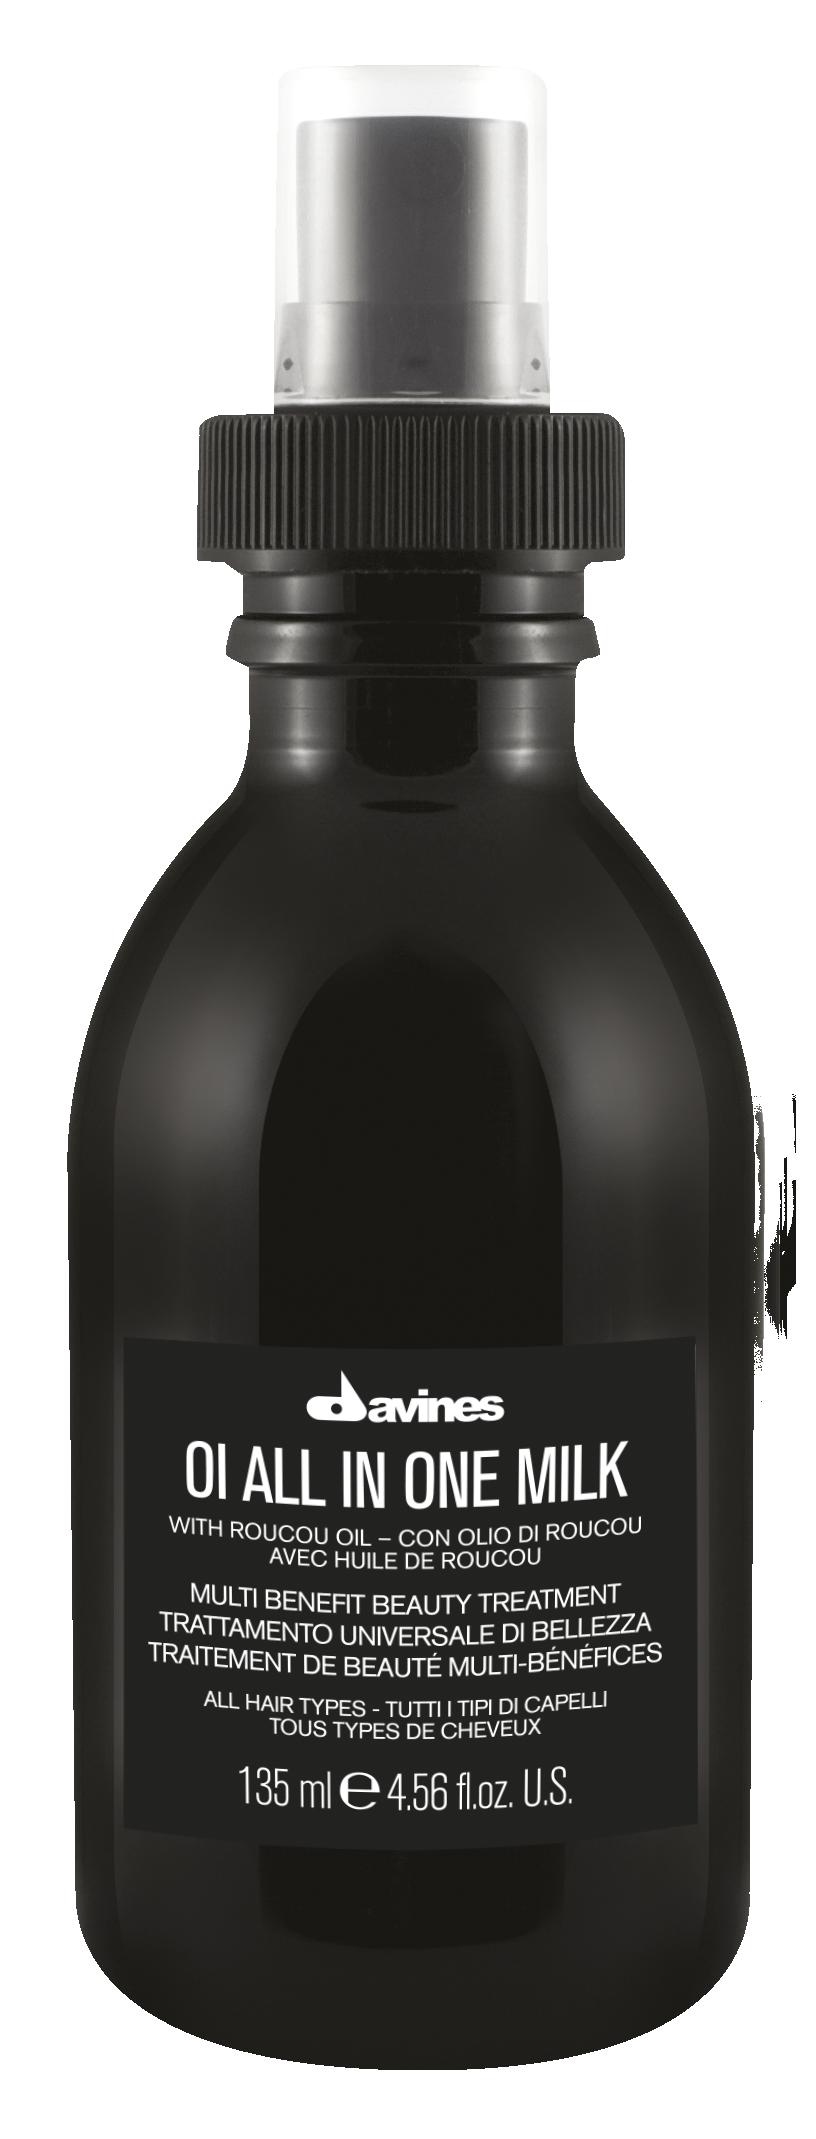 Davines OI All in One Milk, 135ml - Leave-in Spray